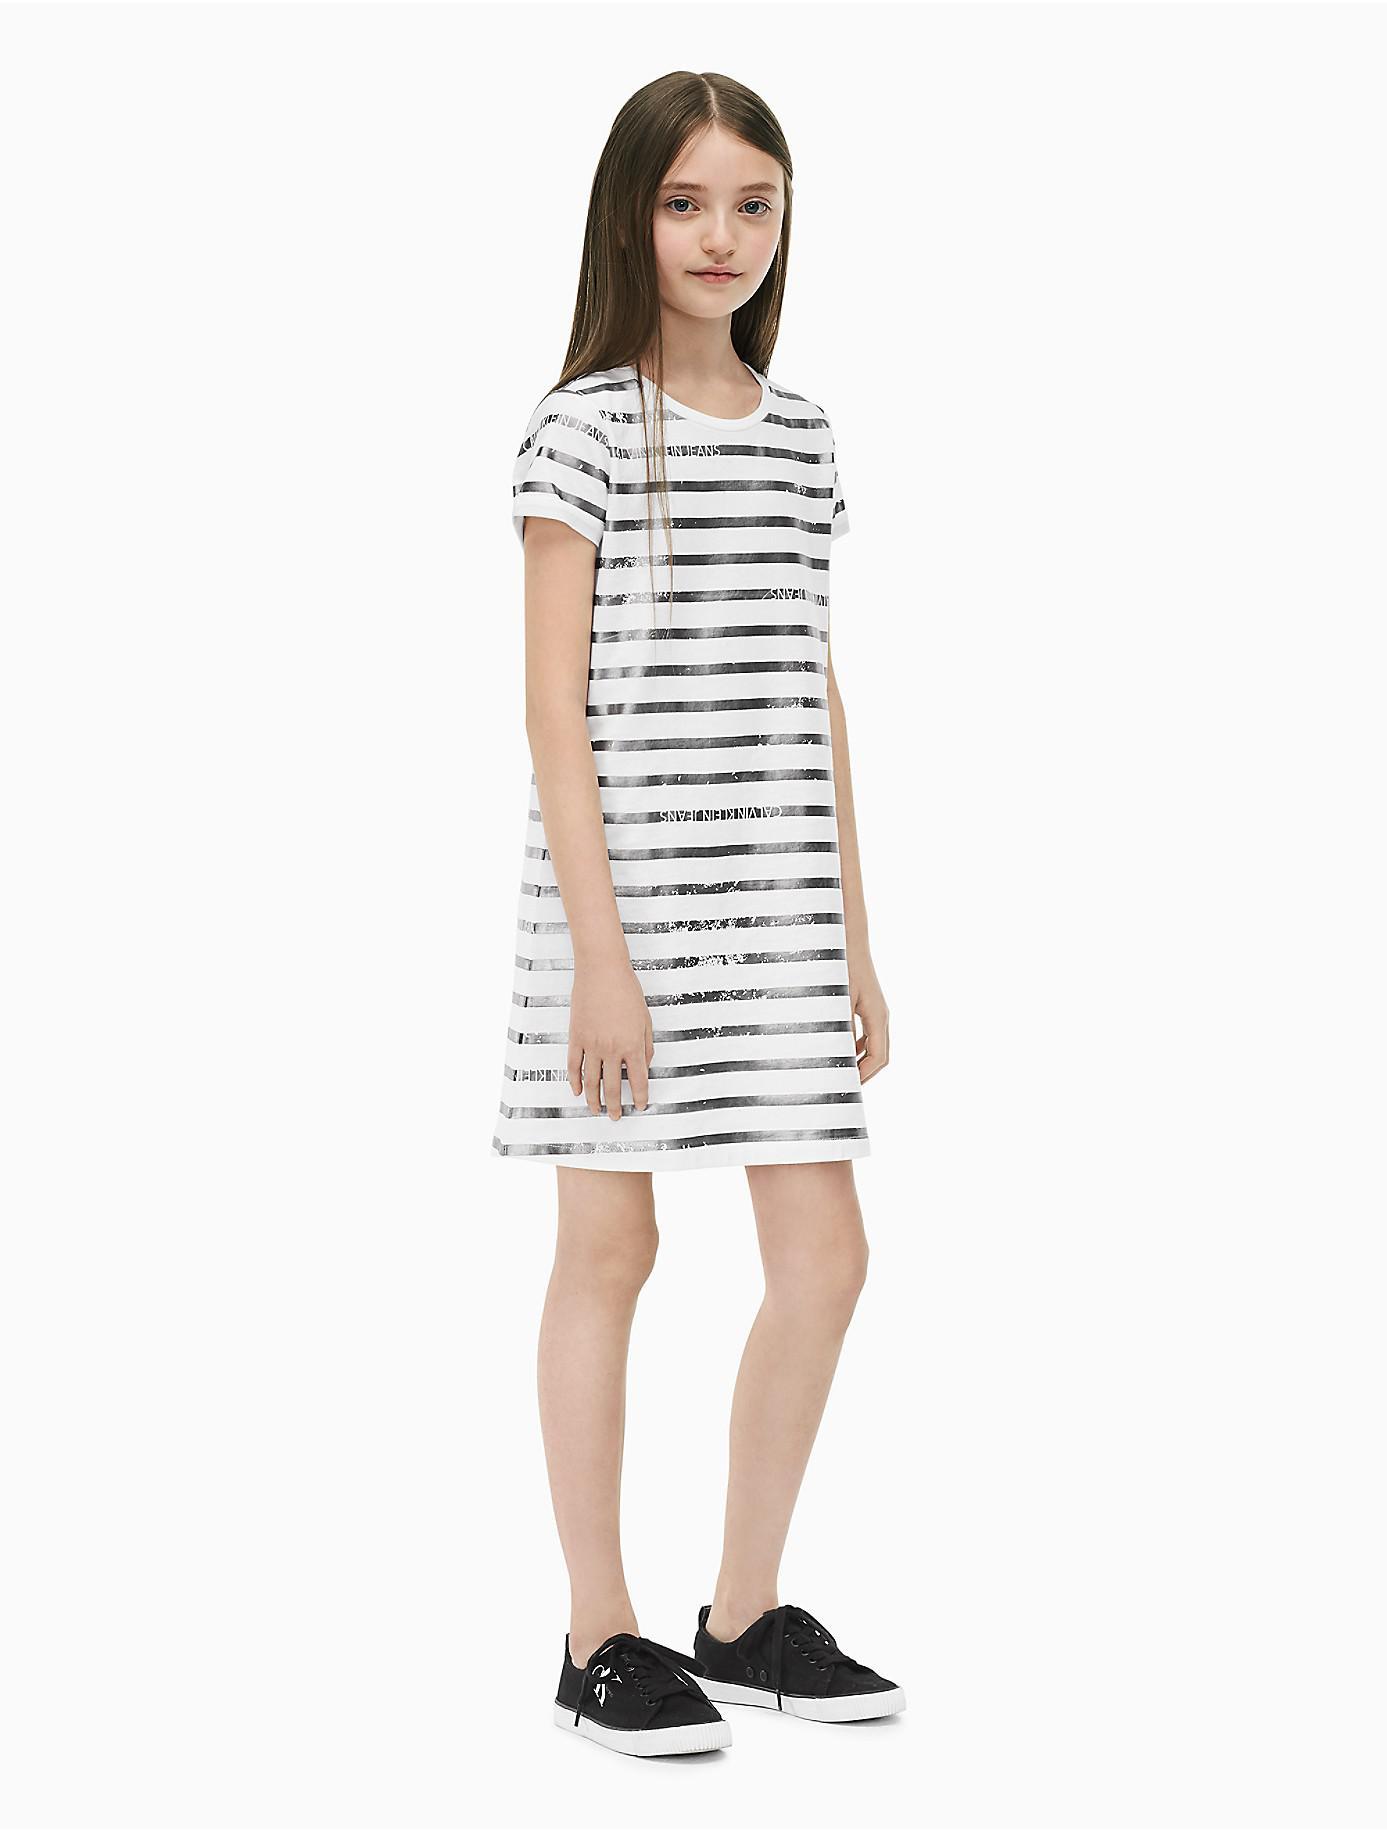 f6398ddb4a3 Lyst - Calvin Klein Girls Striped T-shirt Dress in White